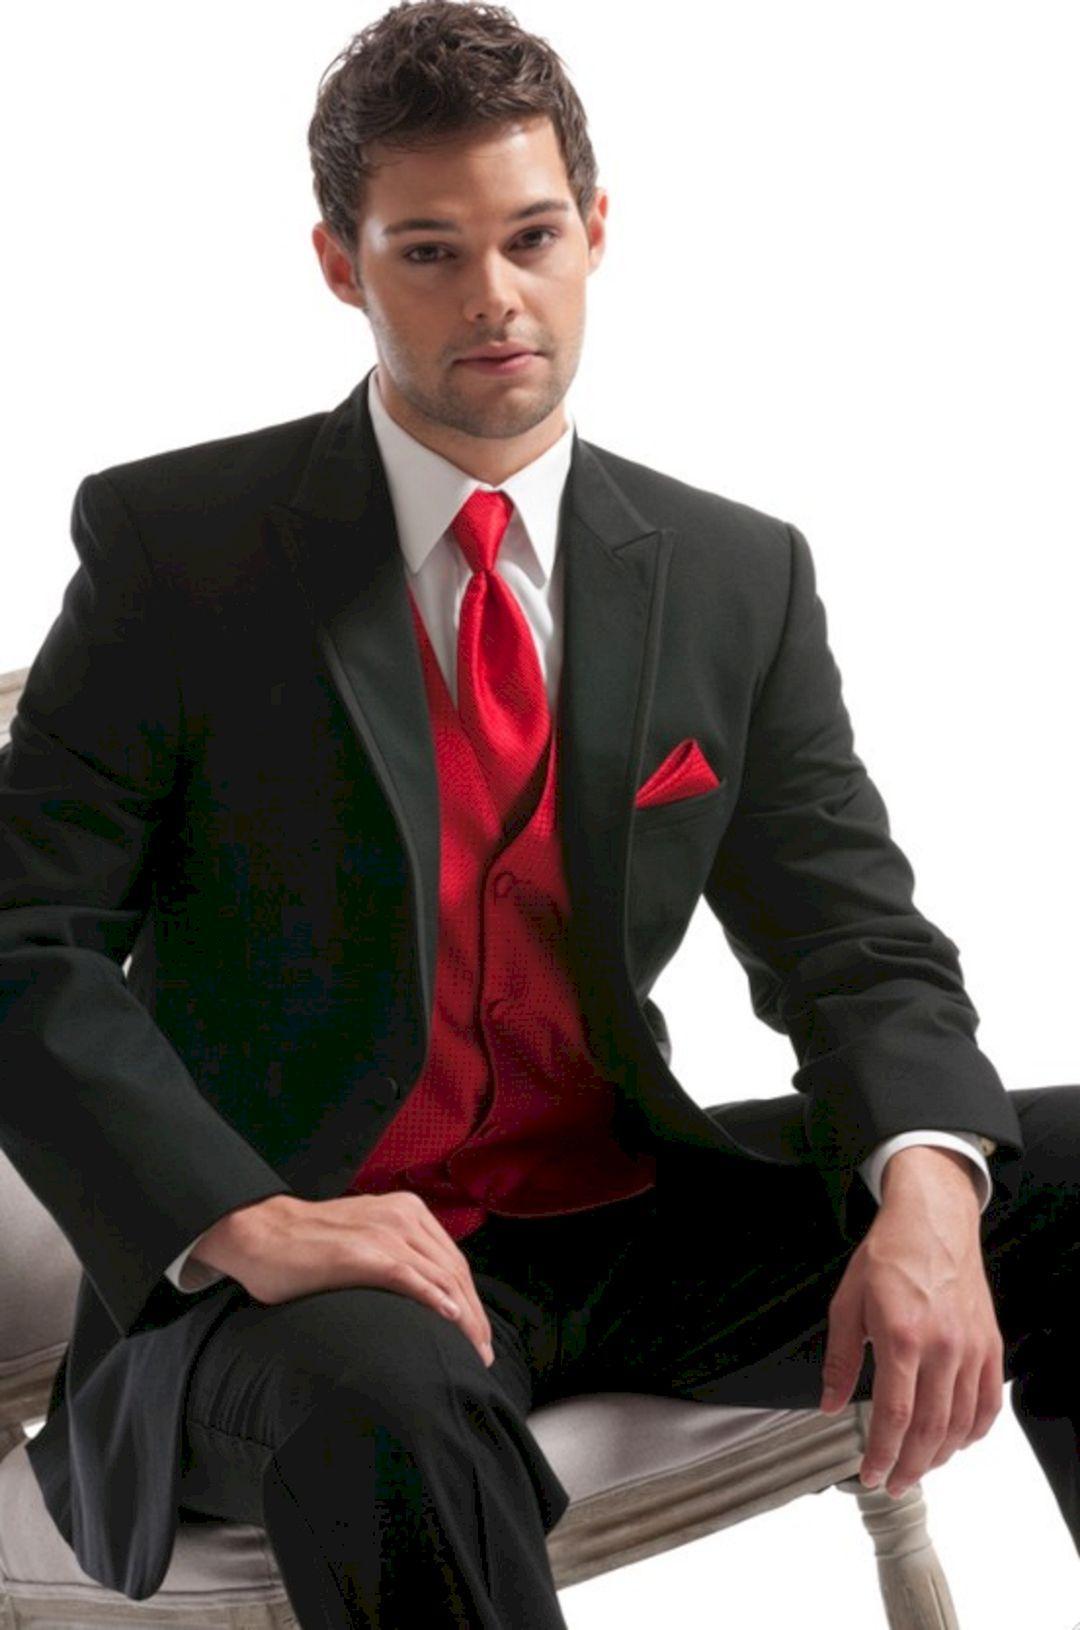 25+ Marvelous Red Black and White Wedding Tuxedo Ideas | Wedding ...